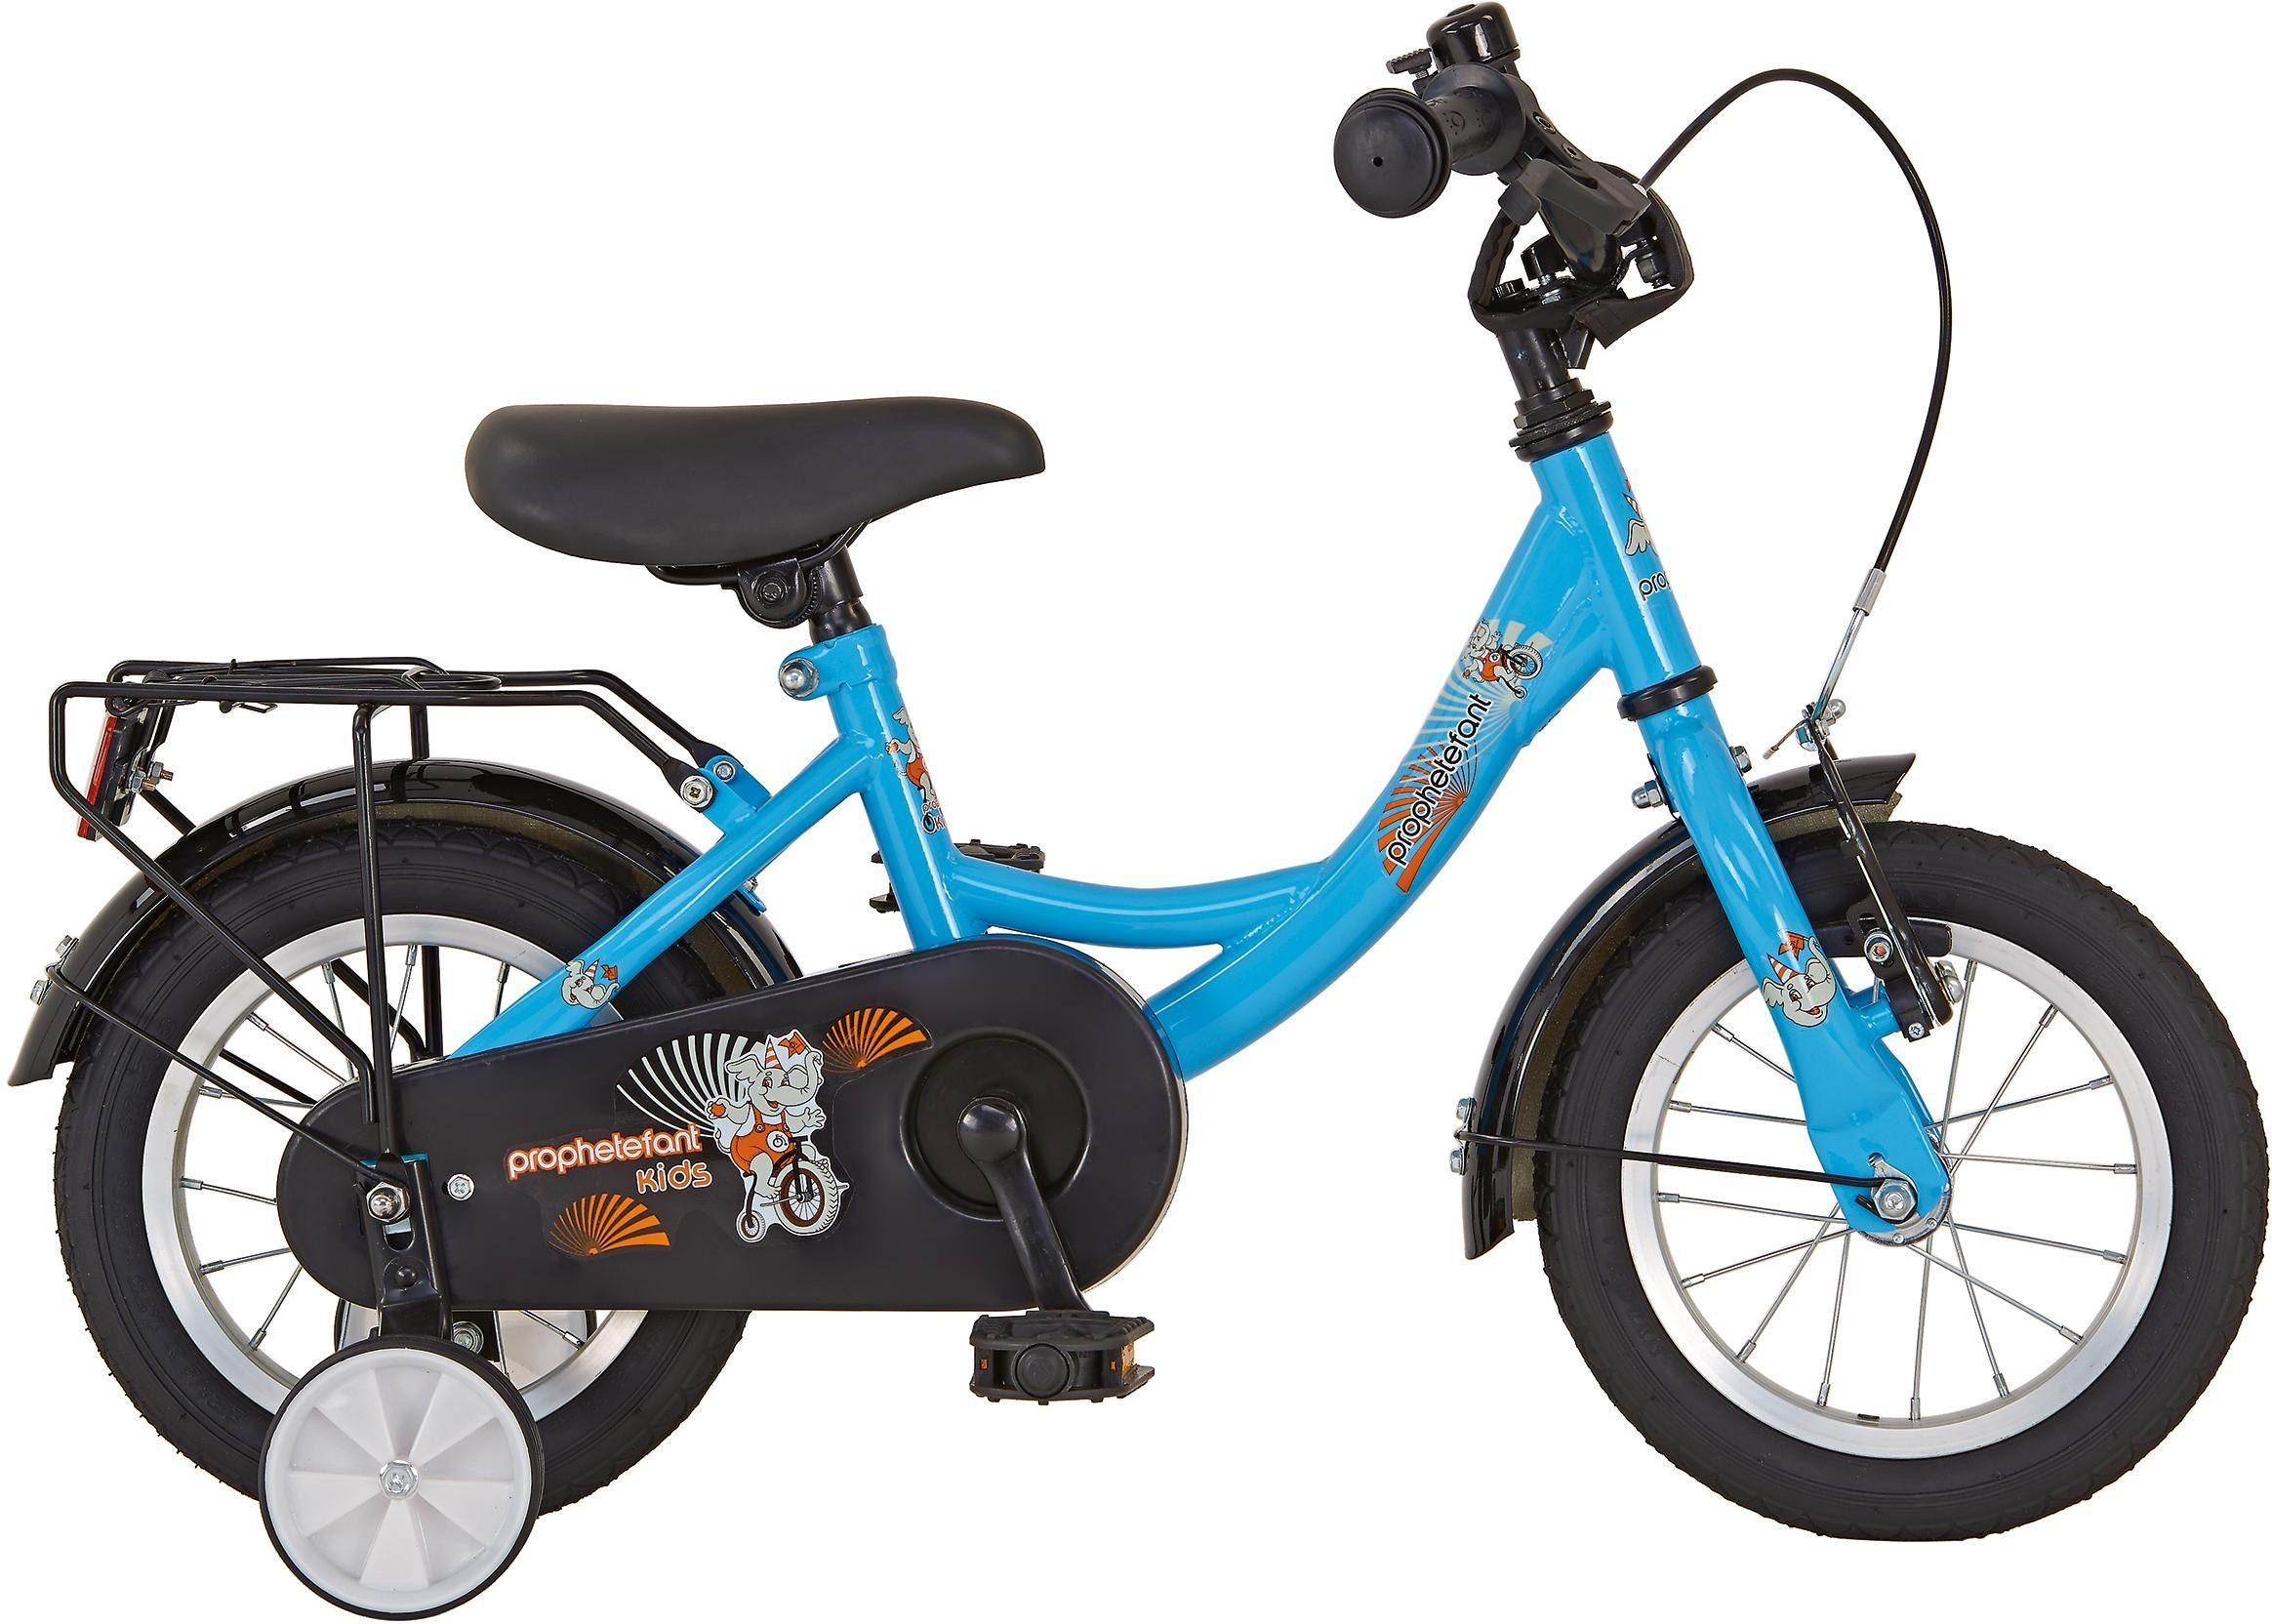 "Prophete Kinderfahrrad »PROPHETE PROPHETEFANT Kids Bike 12,5""«, 1 Gang"